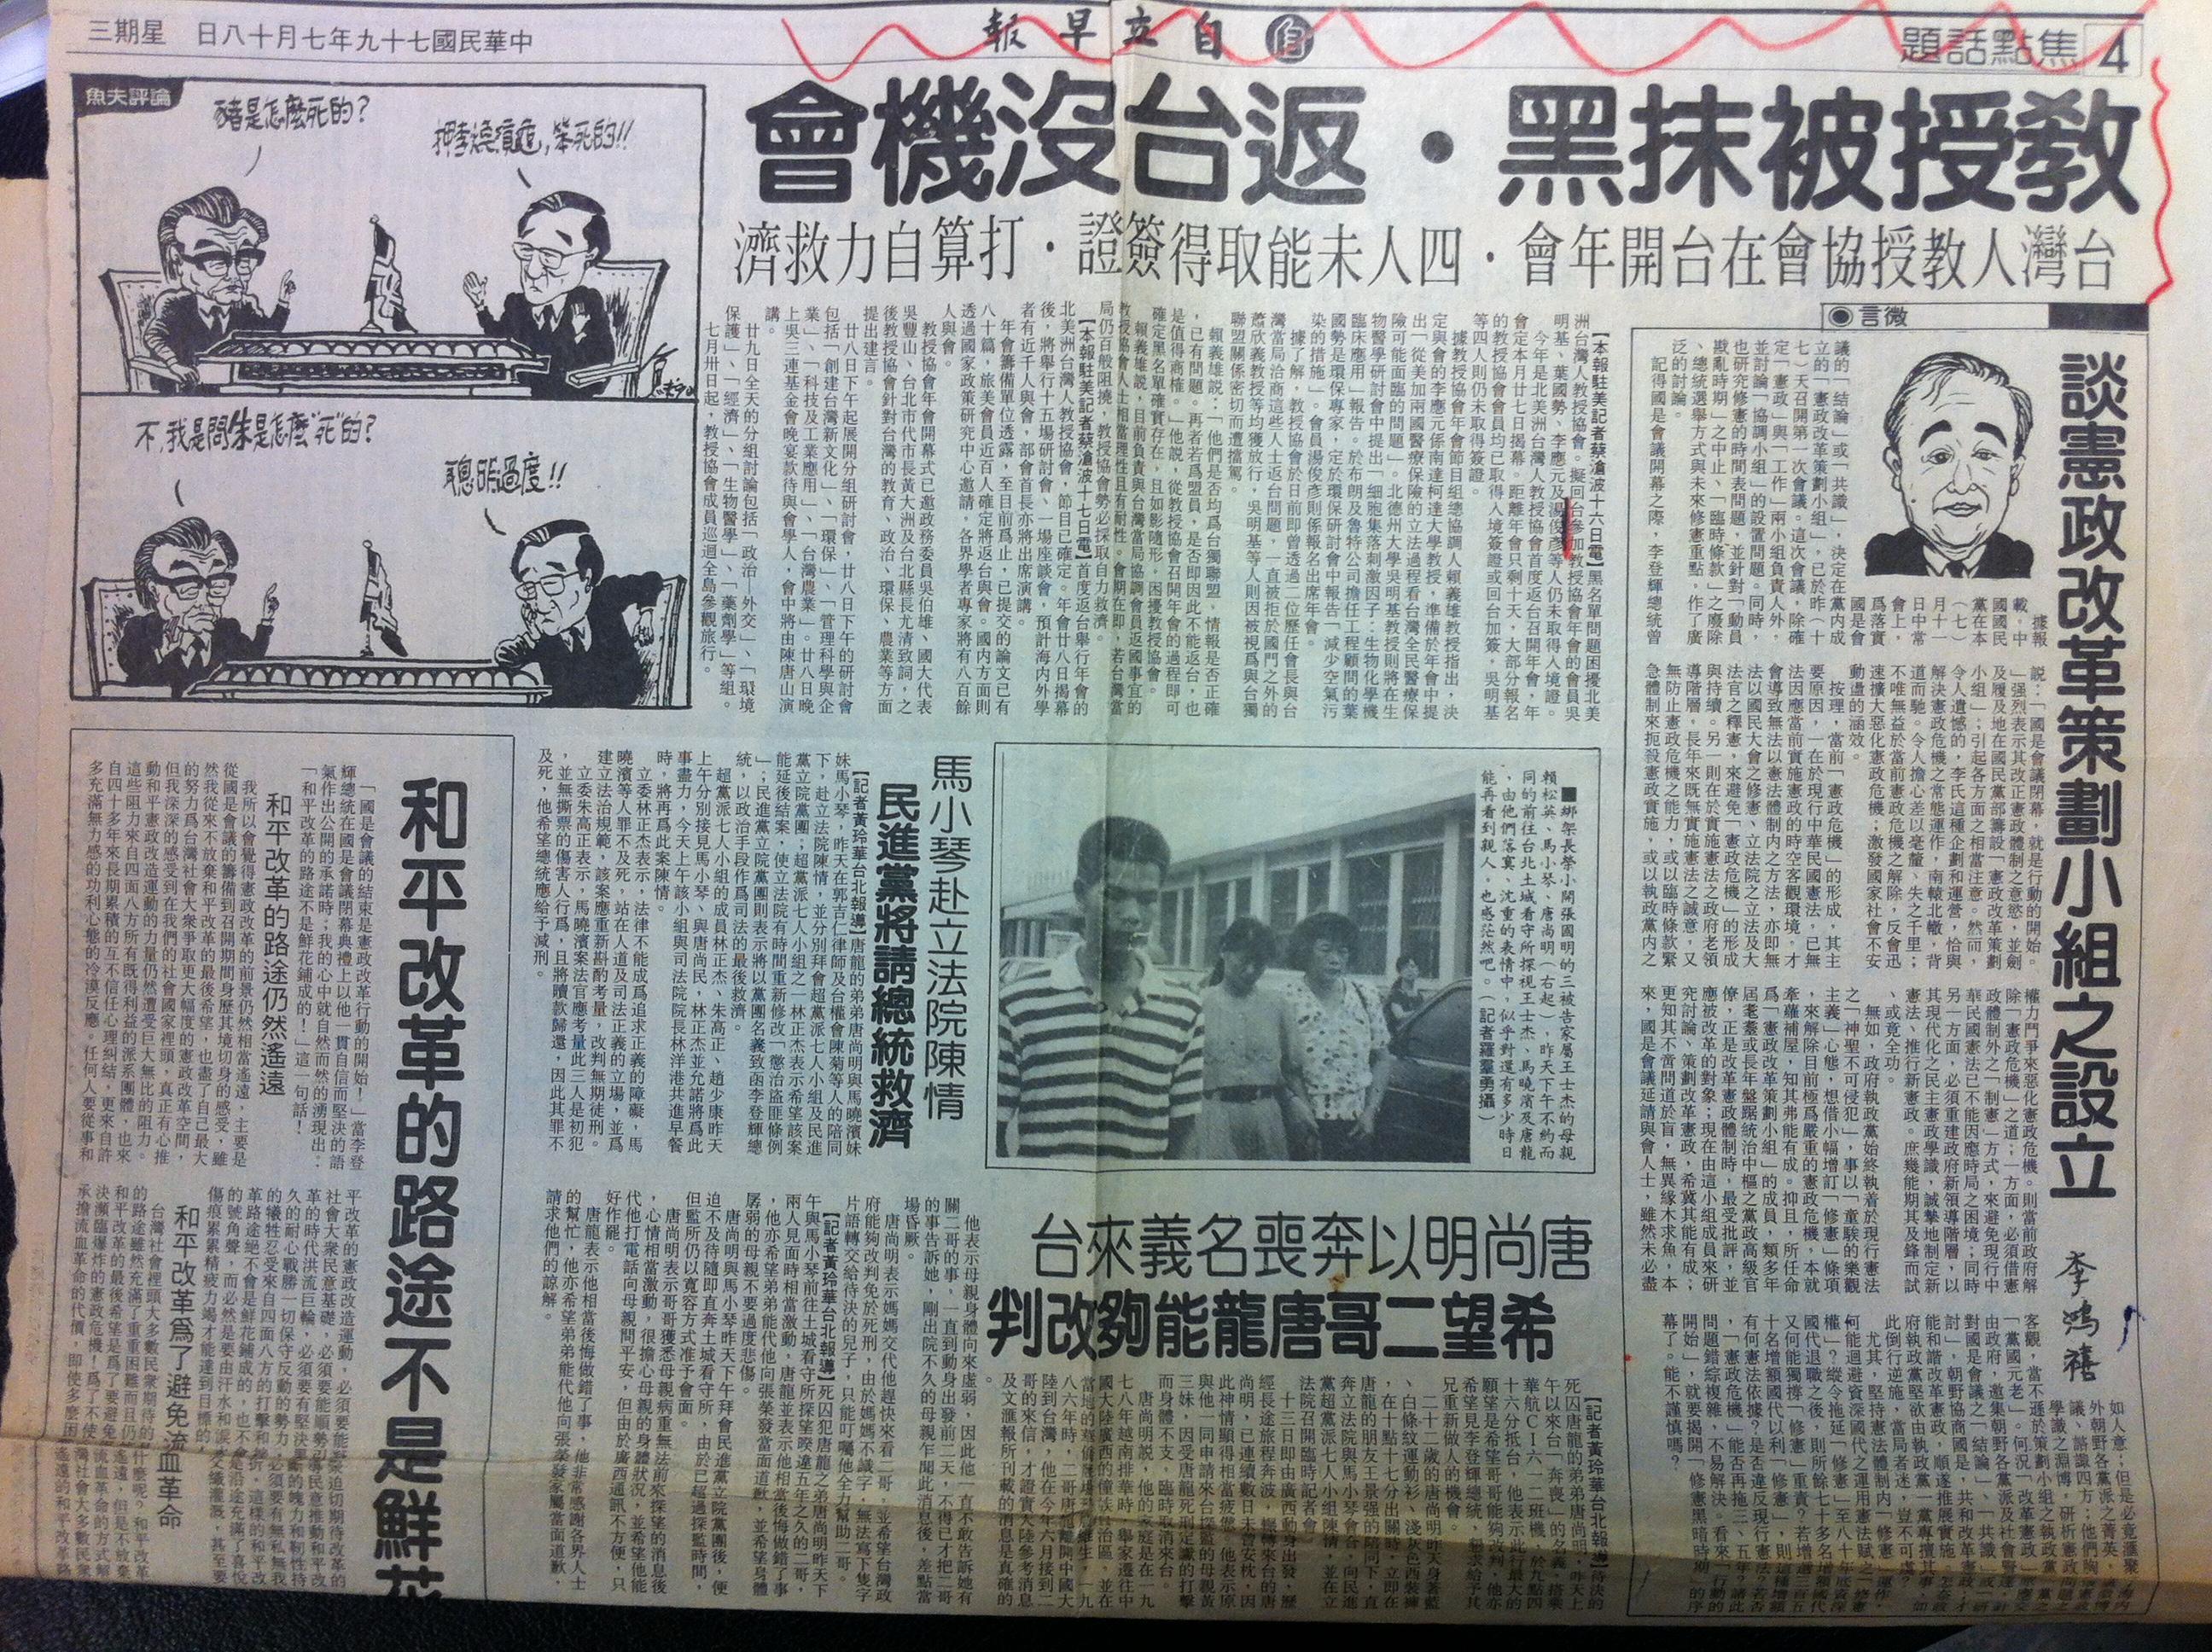 86. Collection of the Dr. Jiunn Yann ( Gene) Tang 湯俊彥博士的收藏